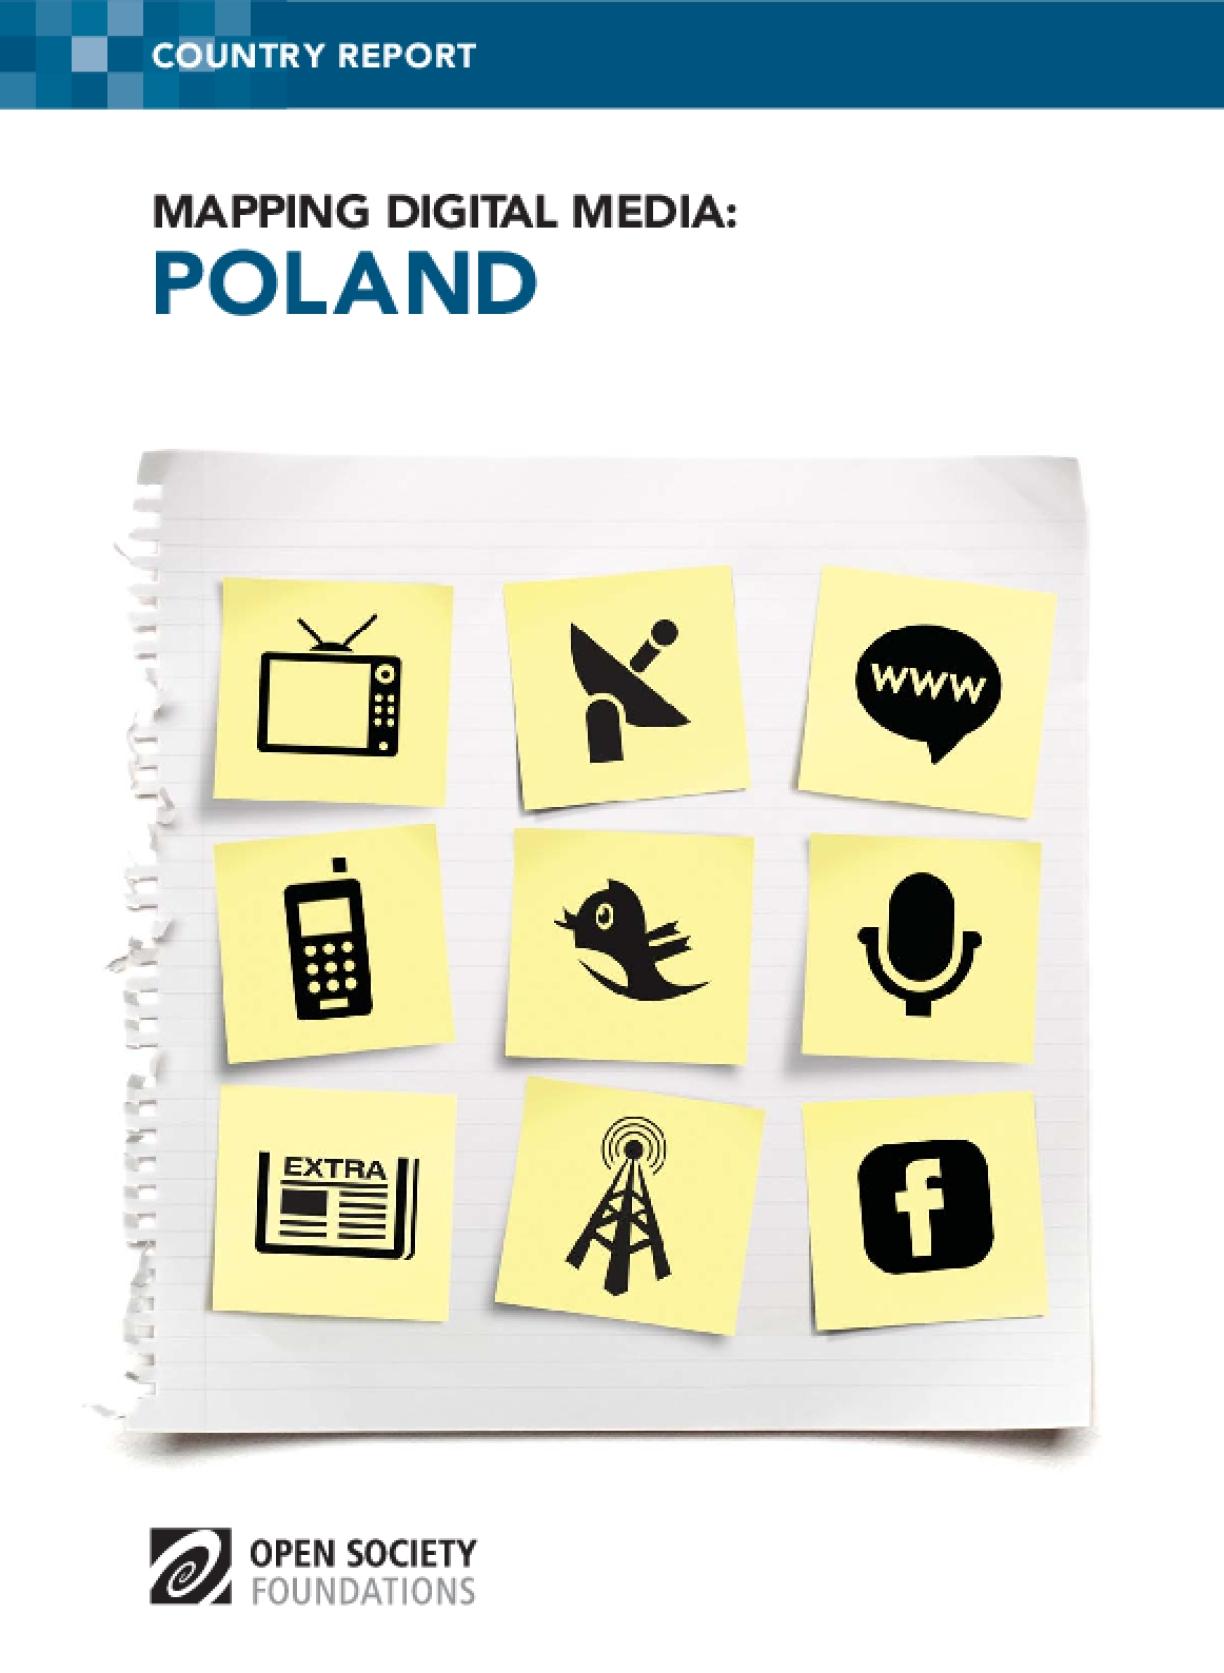 Mapping Digital Media: Poland